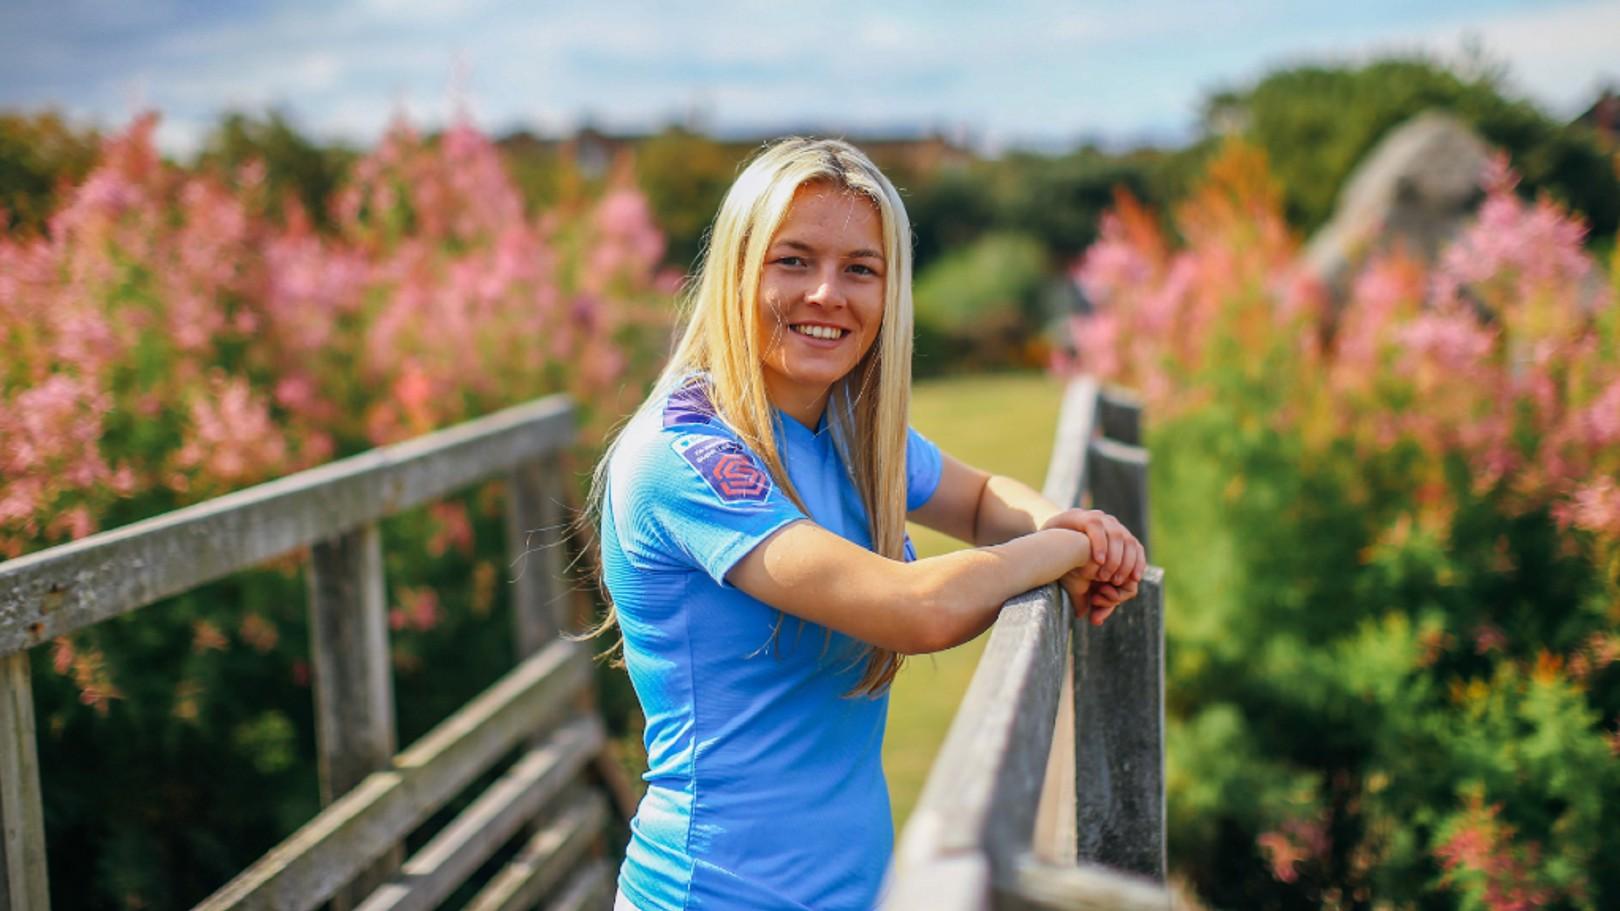 HEMP DAY: Lauren Hemp is ready to show what she can do